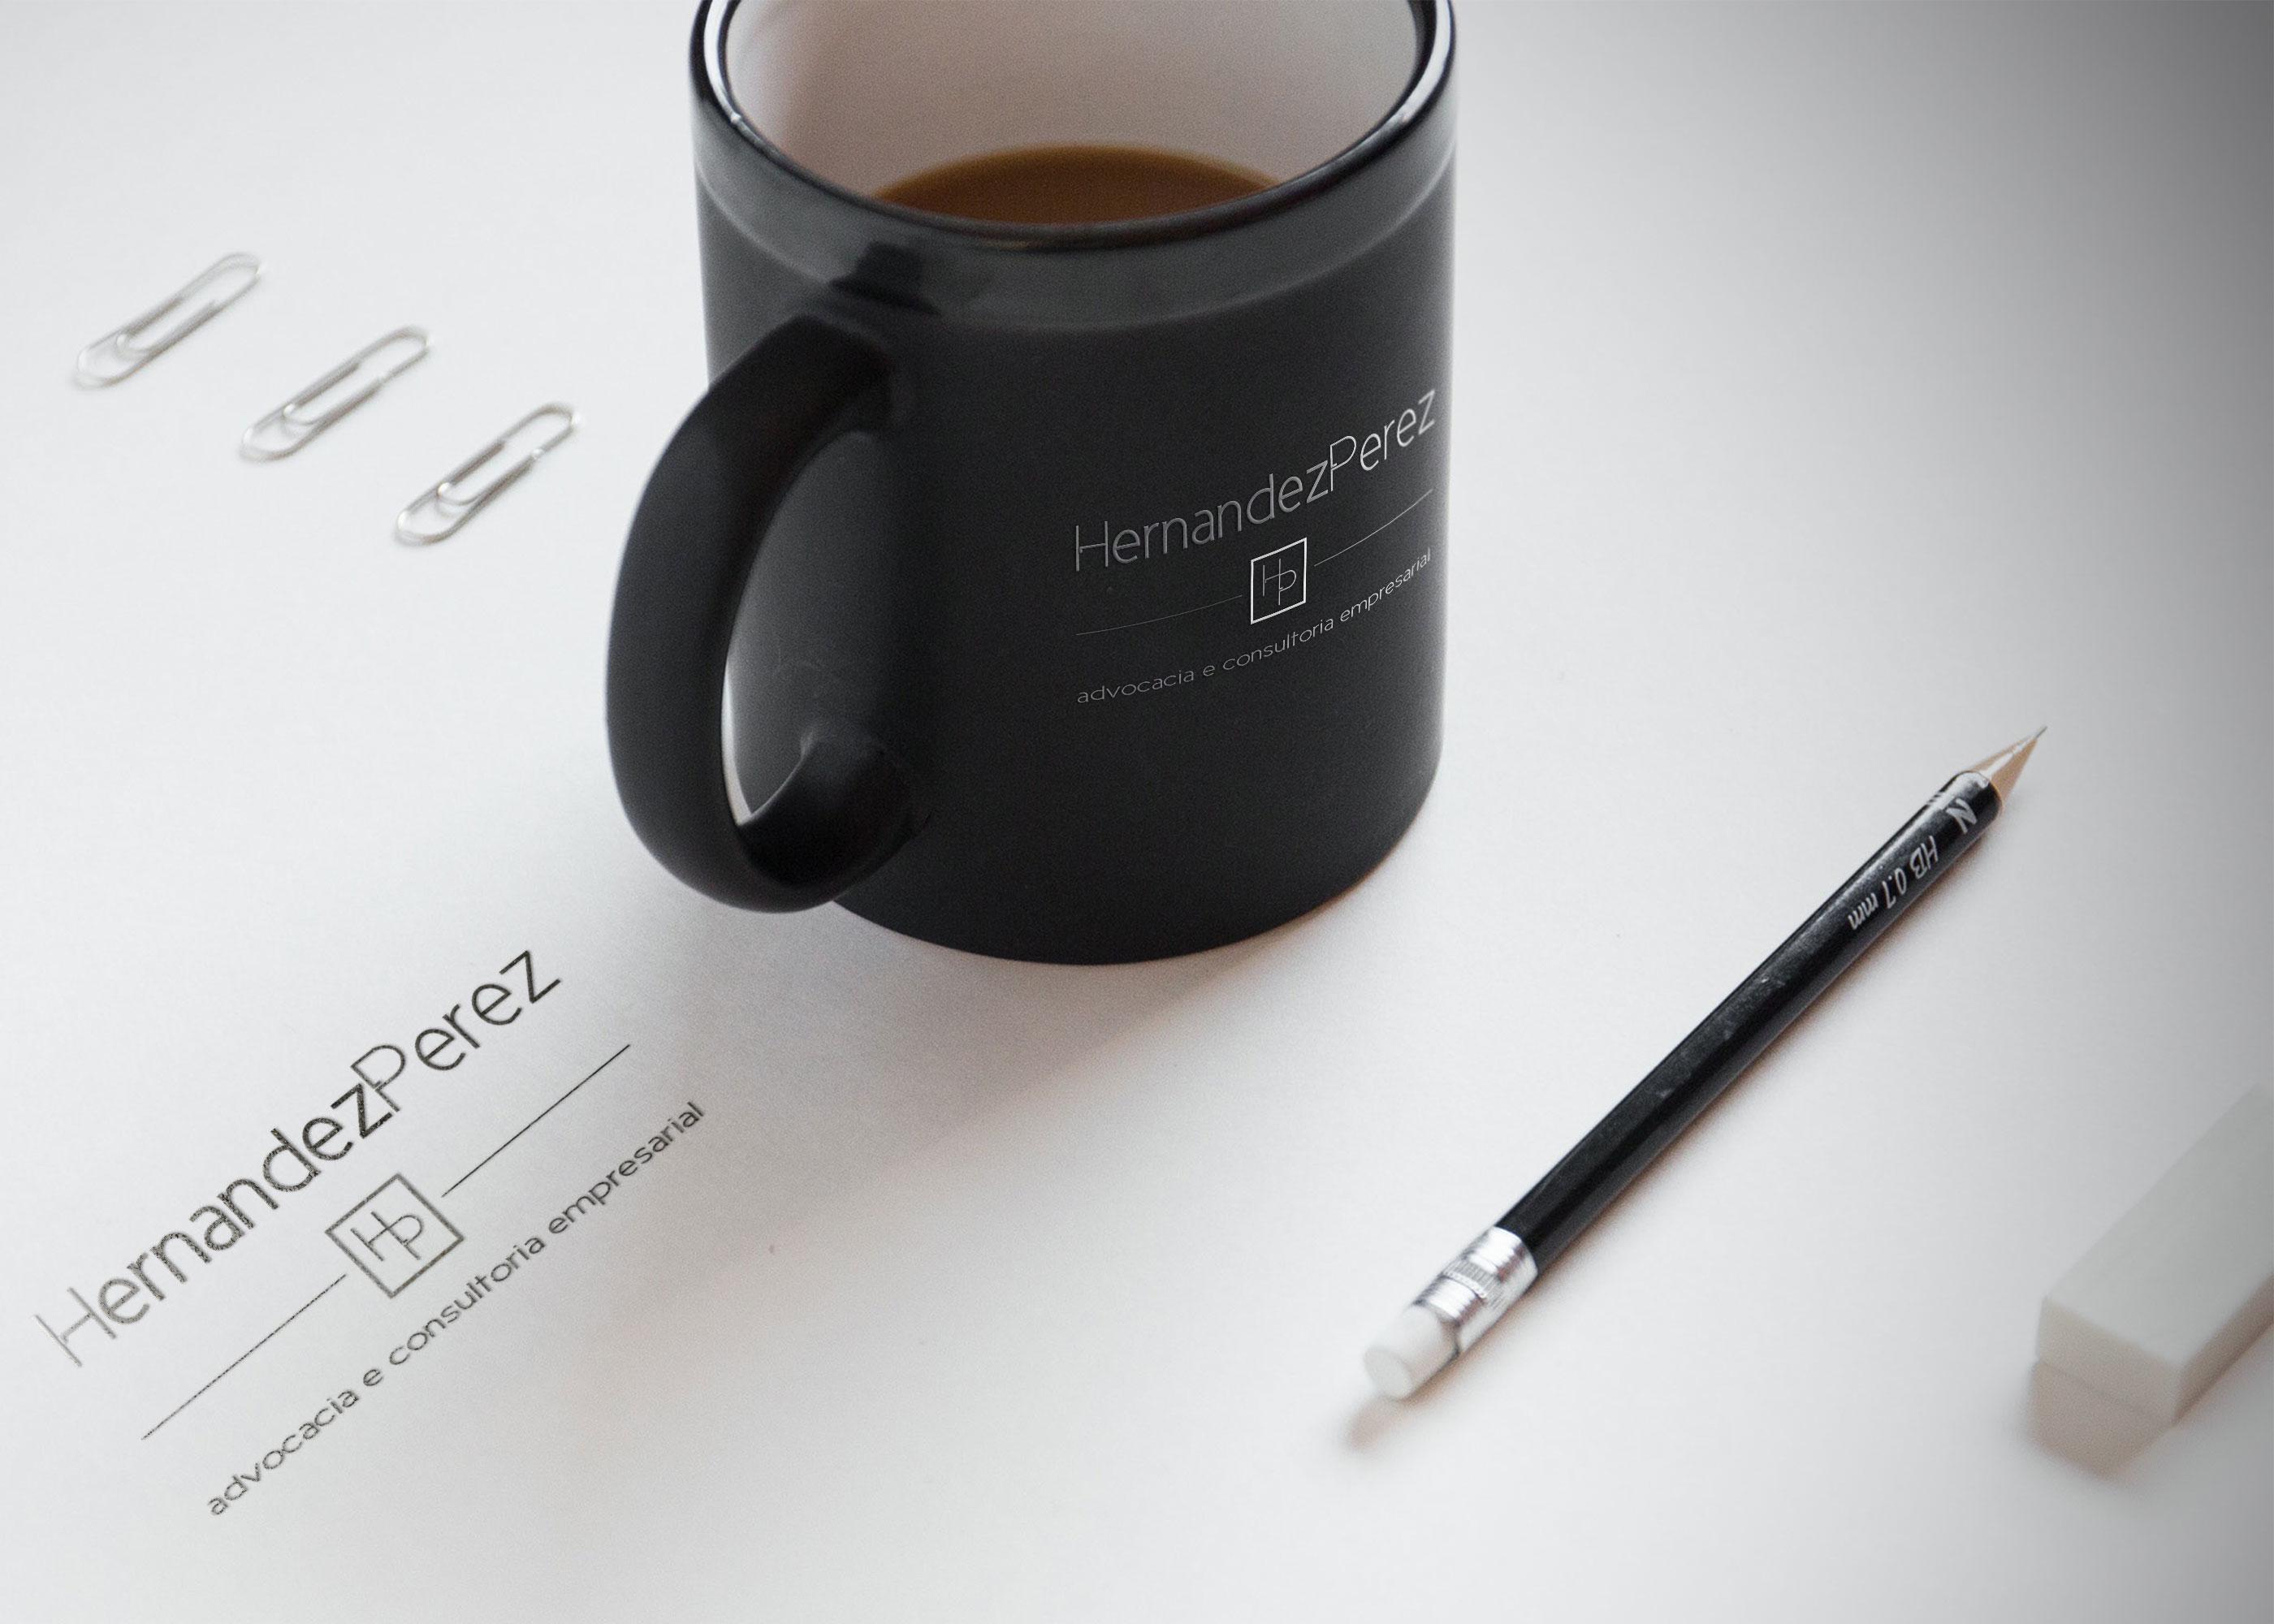 Branding da marca Hernandez Perez Consultoria empresarial